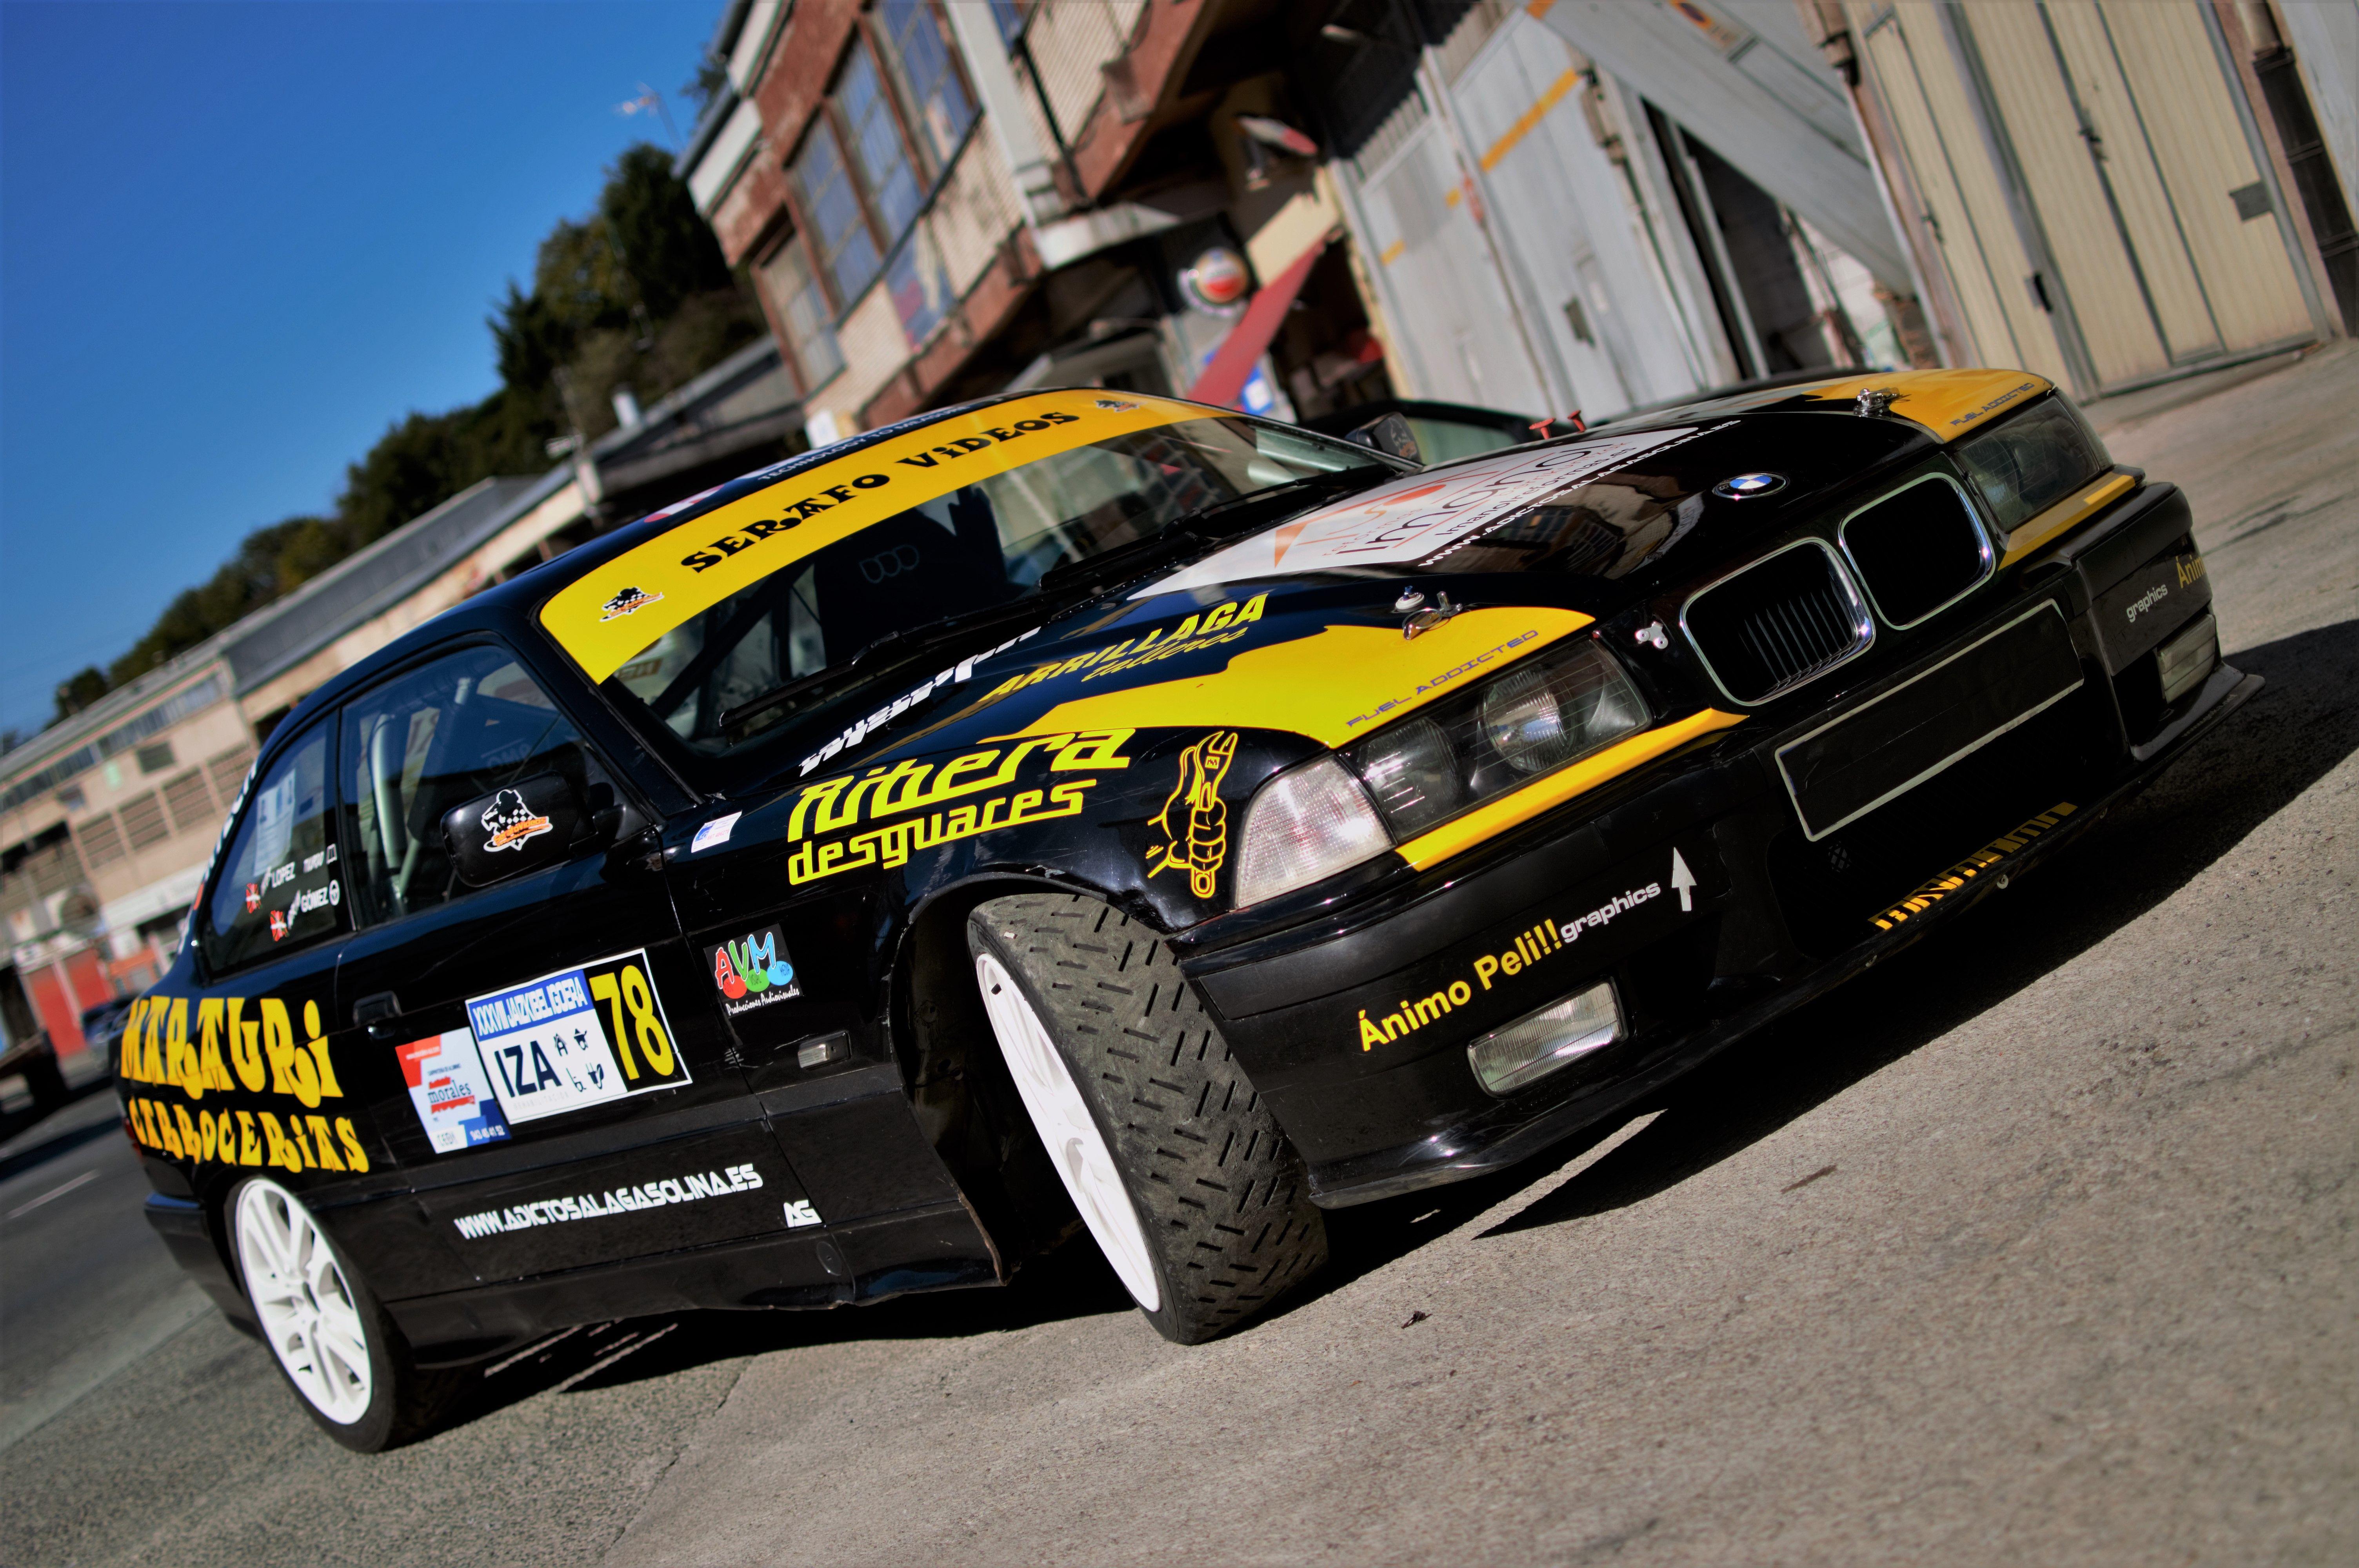 Circuito Kotarr : Pin by crpgy on fast and nice circuito kotarr